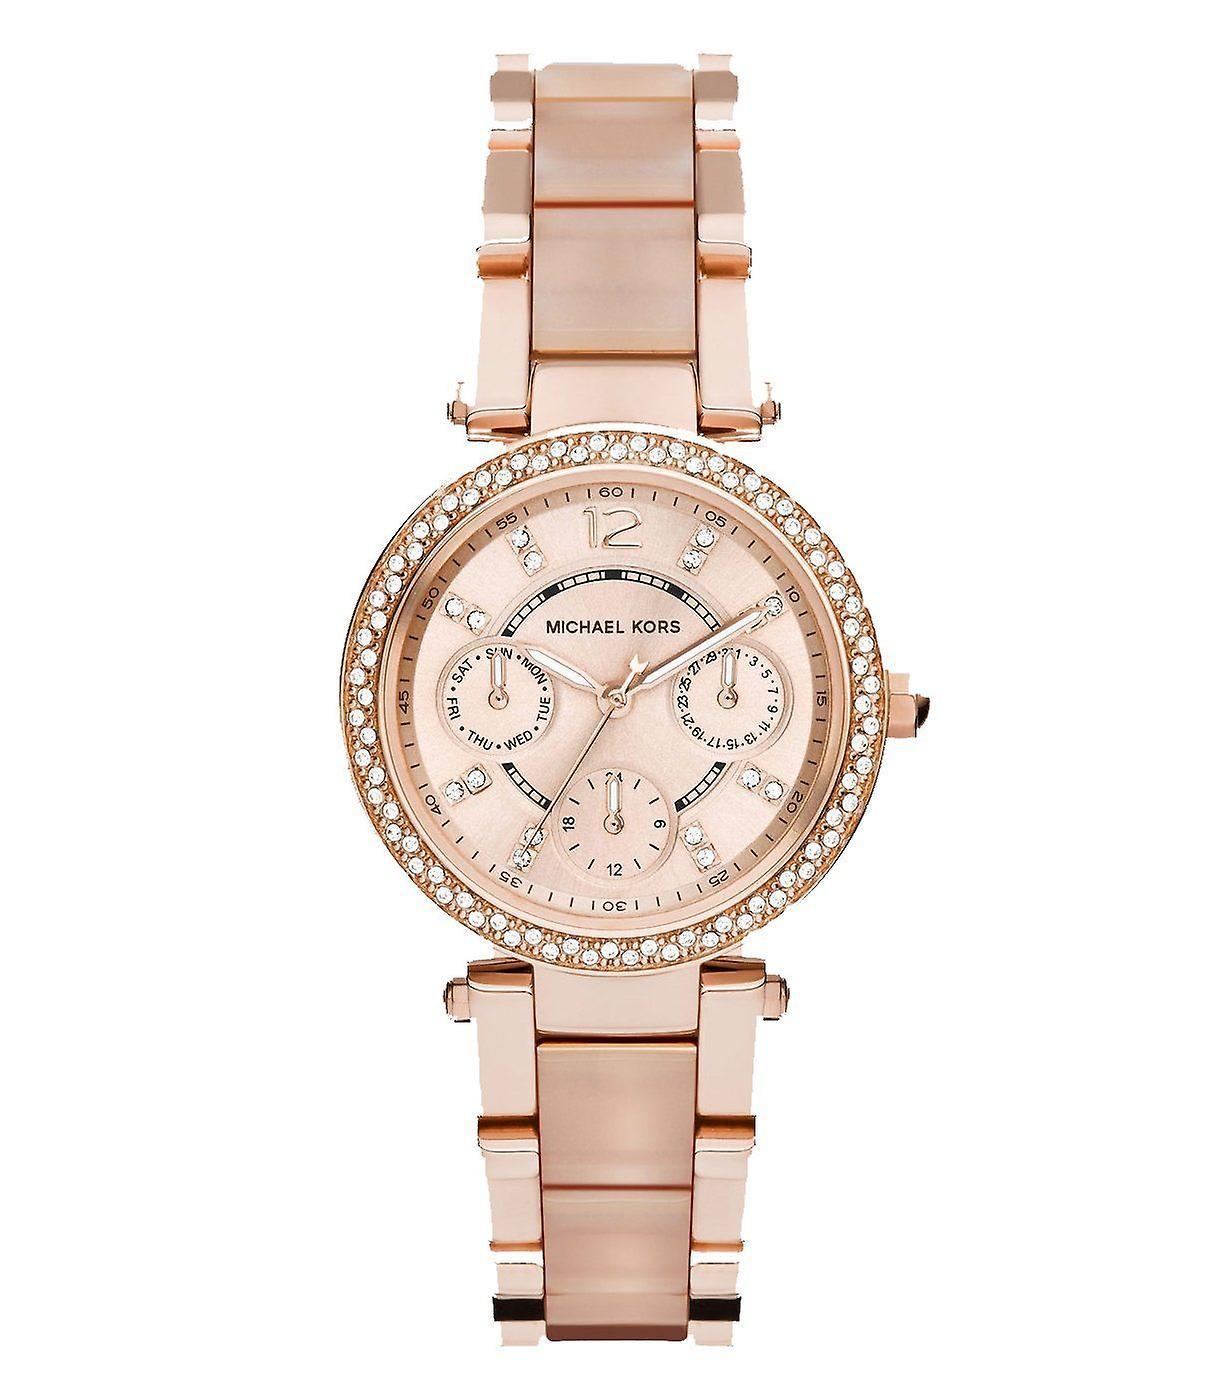 Michael Kors Ladies' Mini Parker Chronograph Watch MK6110